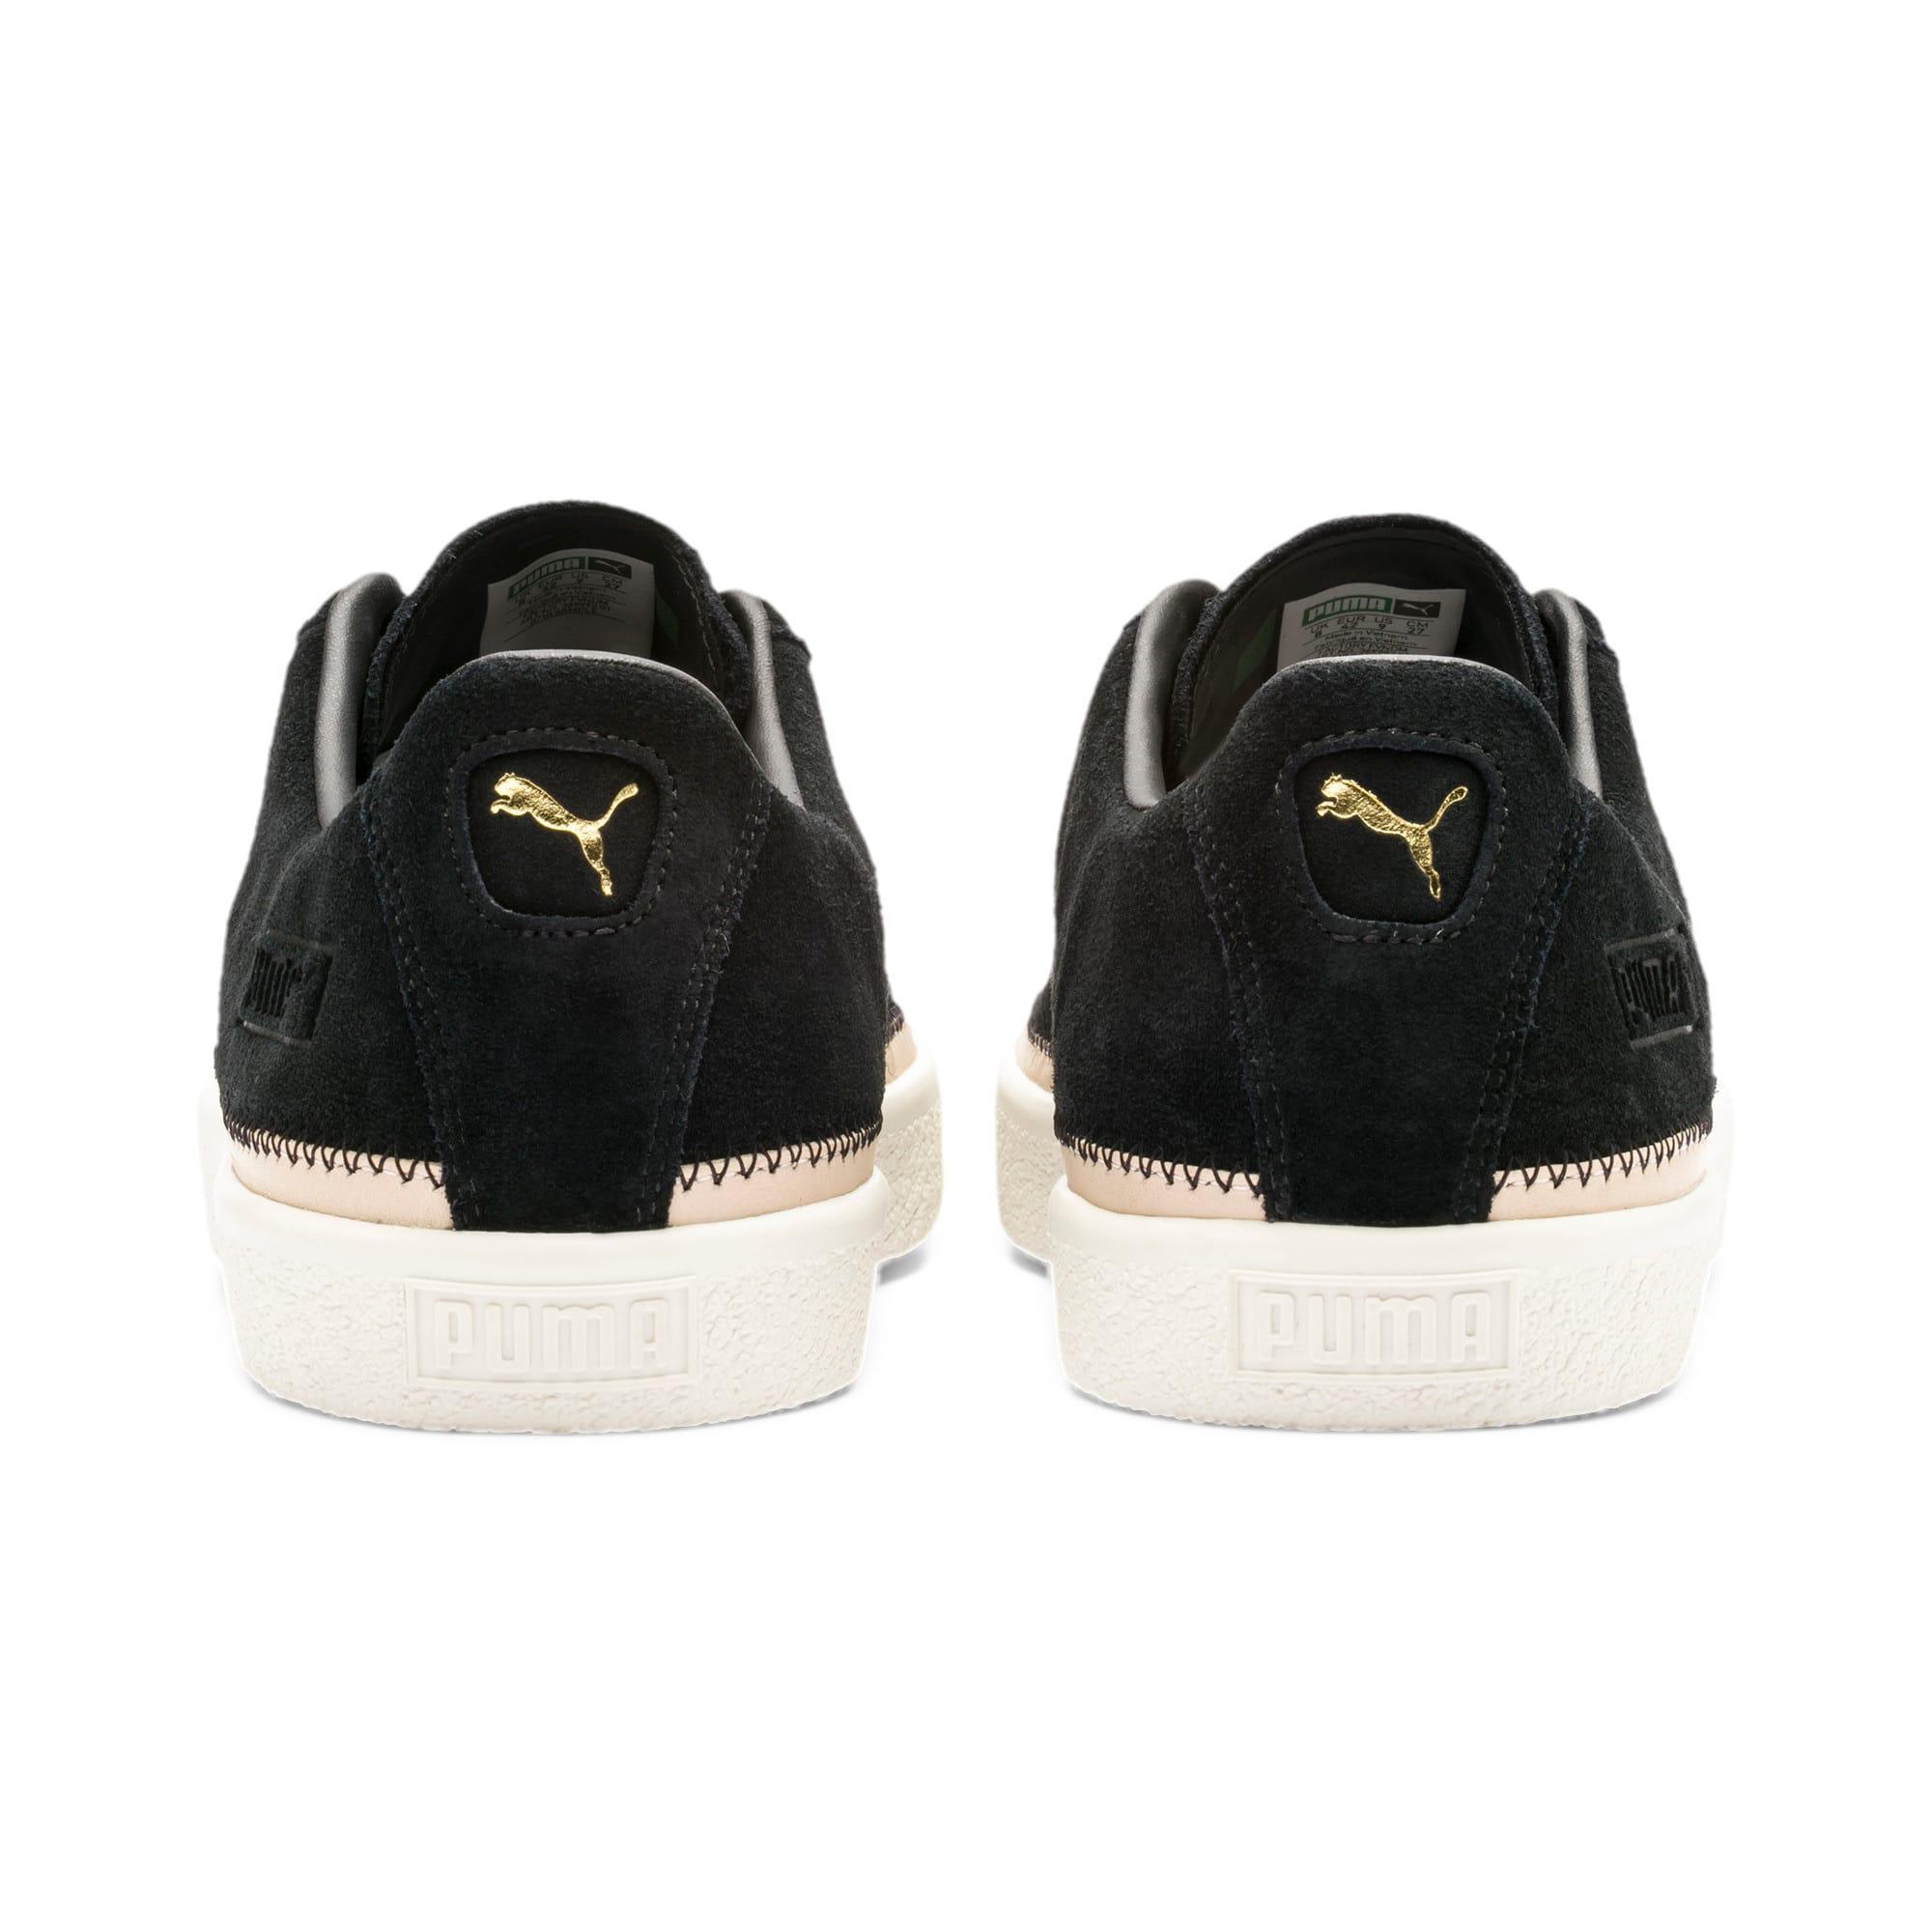 Thumbnail 4 of Suede Trim PRM Sneakers, Puma Black-Whisper White, medium